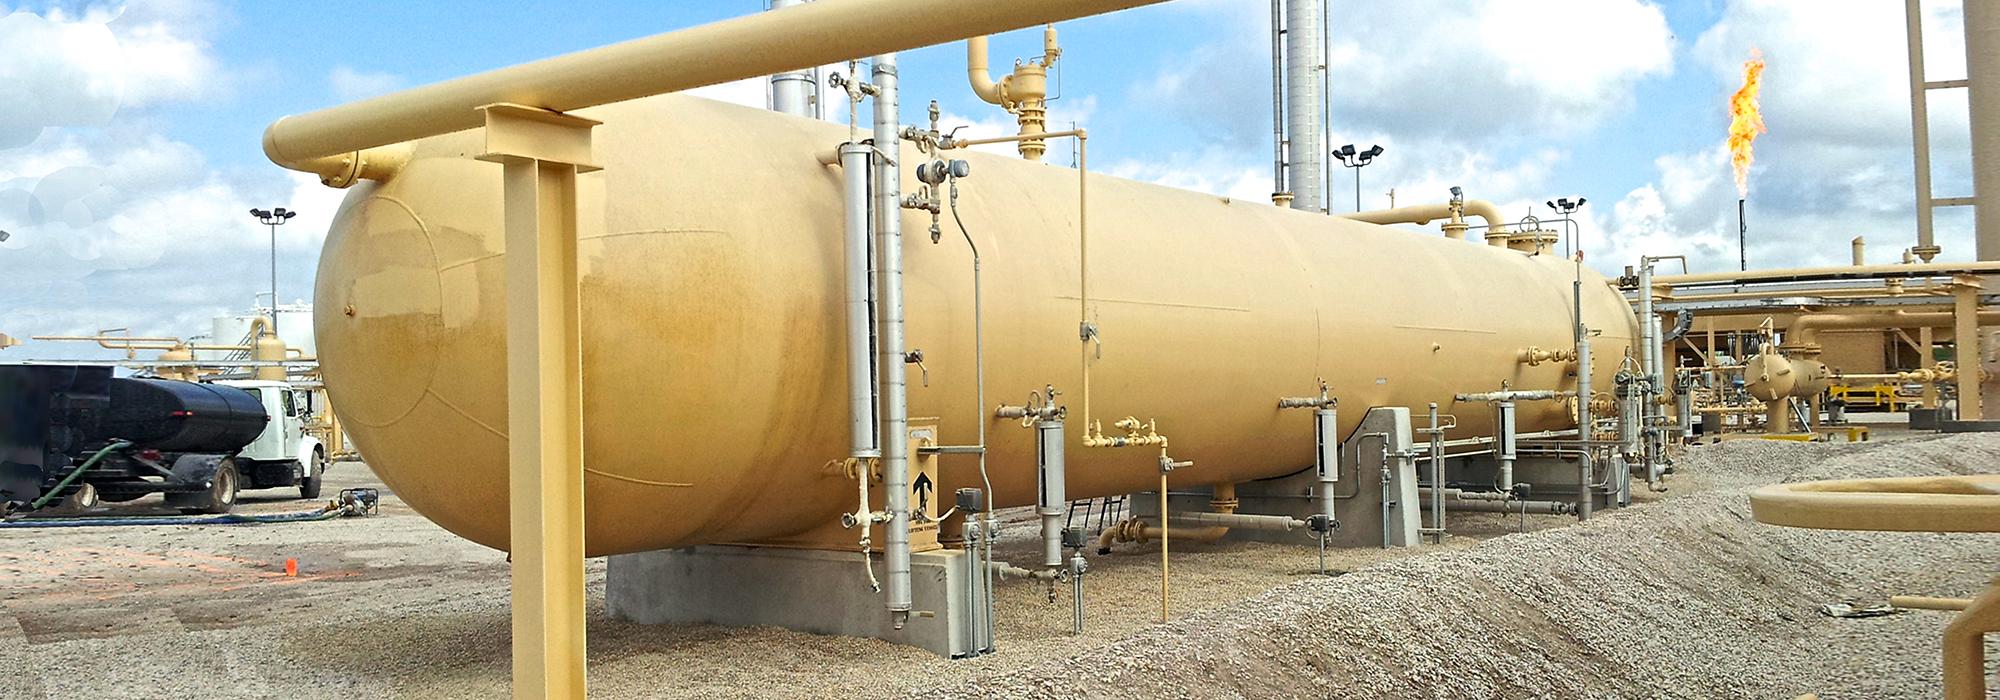 ASME NGL LPG Process Vessel Fabrication-1.png